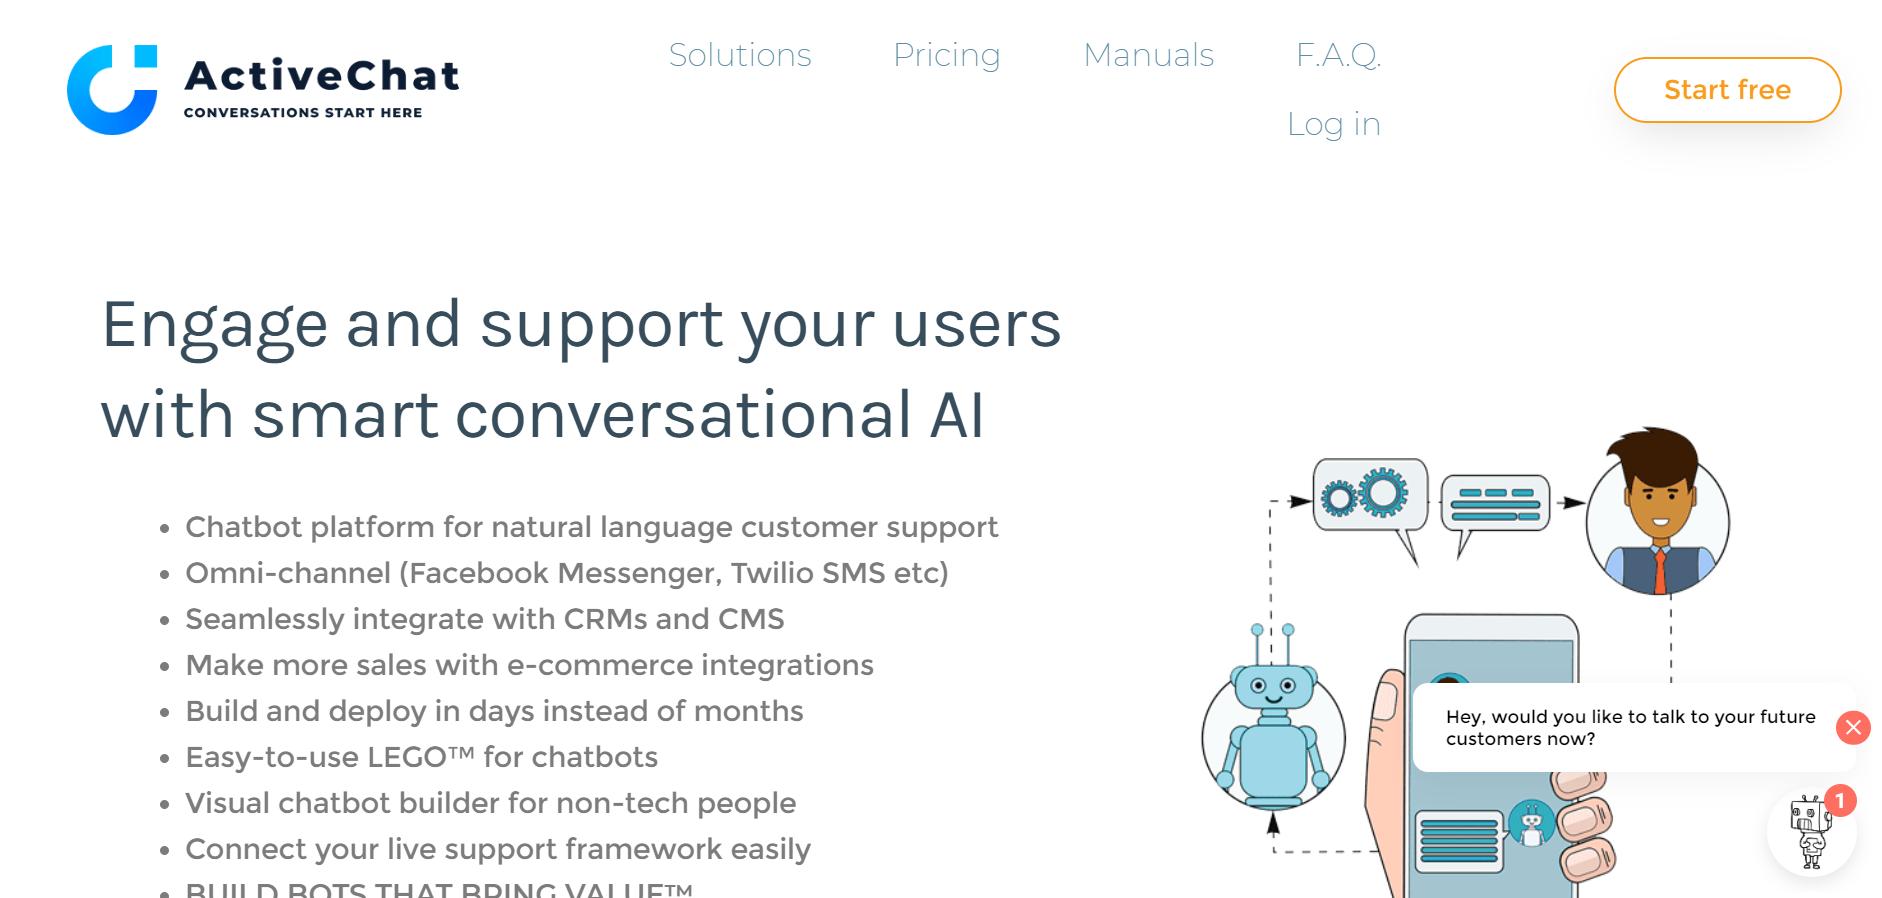 best enterprise chat software - ActiveChat